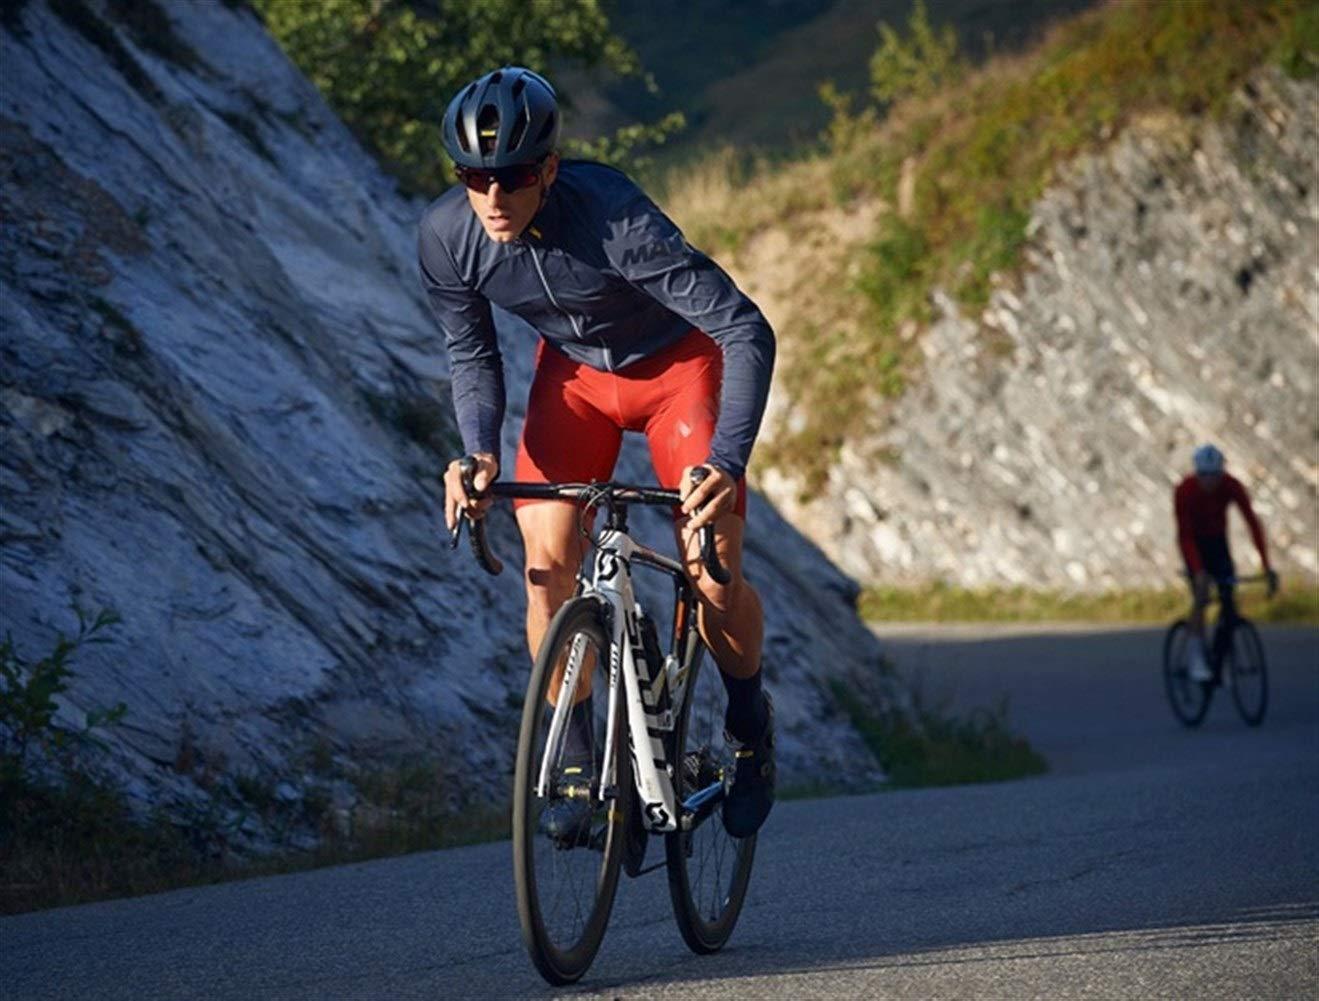 MJTCJY New Pro Team Mavic Cyclisme Cuissard Race L/ég/ère Bib Pant for Long Time Bicycle Ride Bottom Ropa Ciclismo Bike